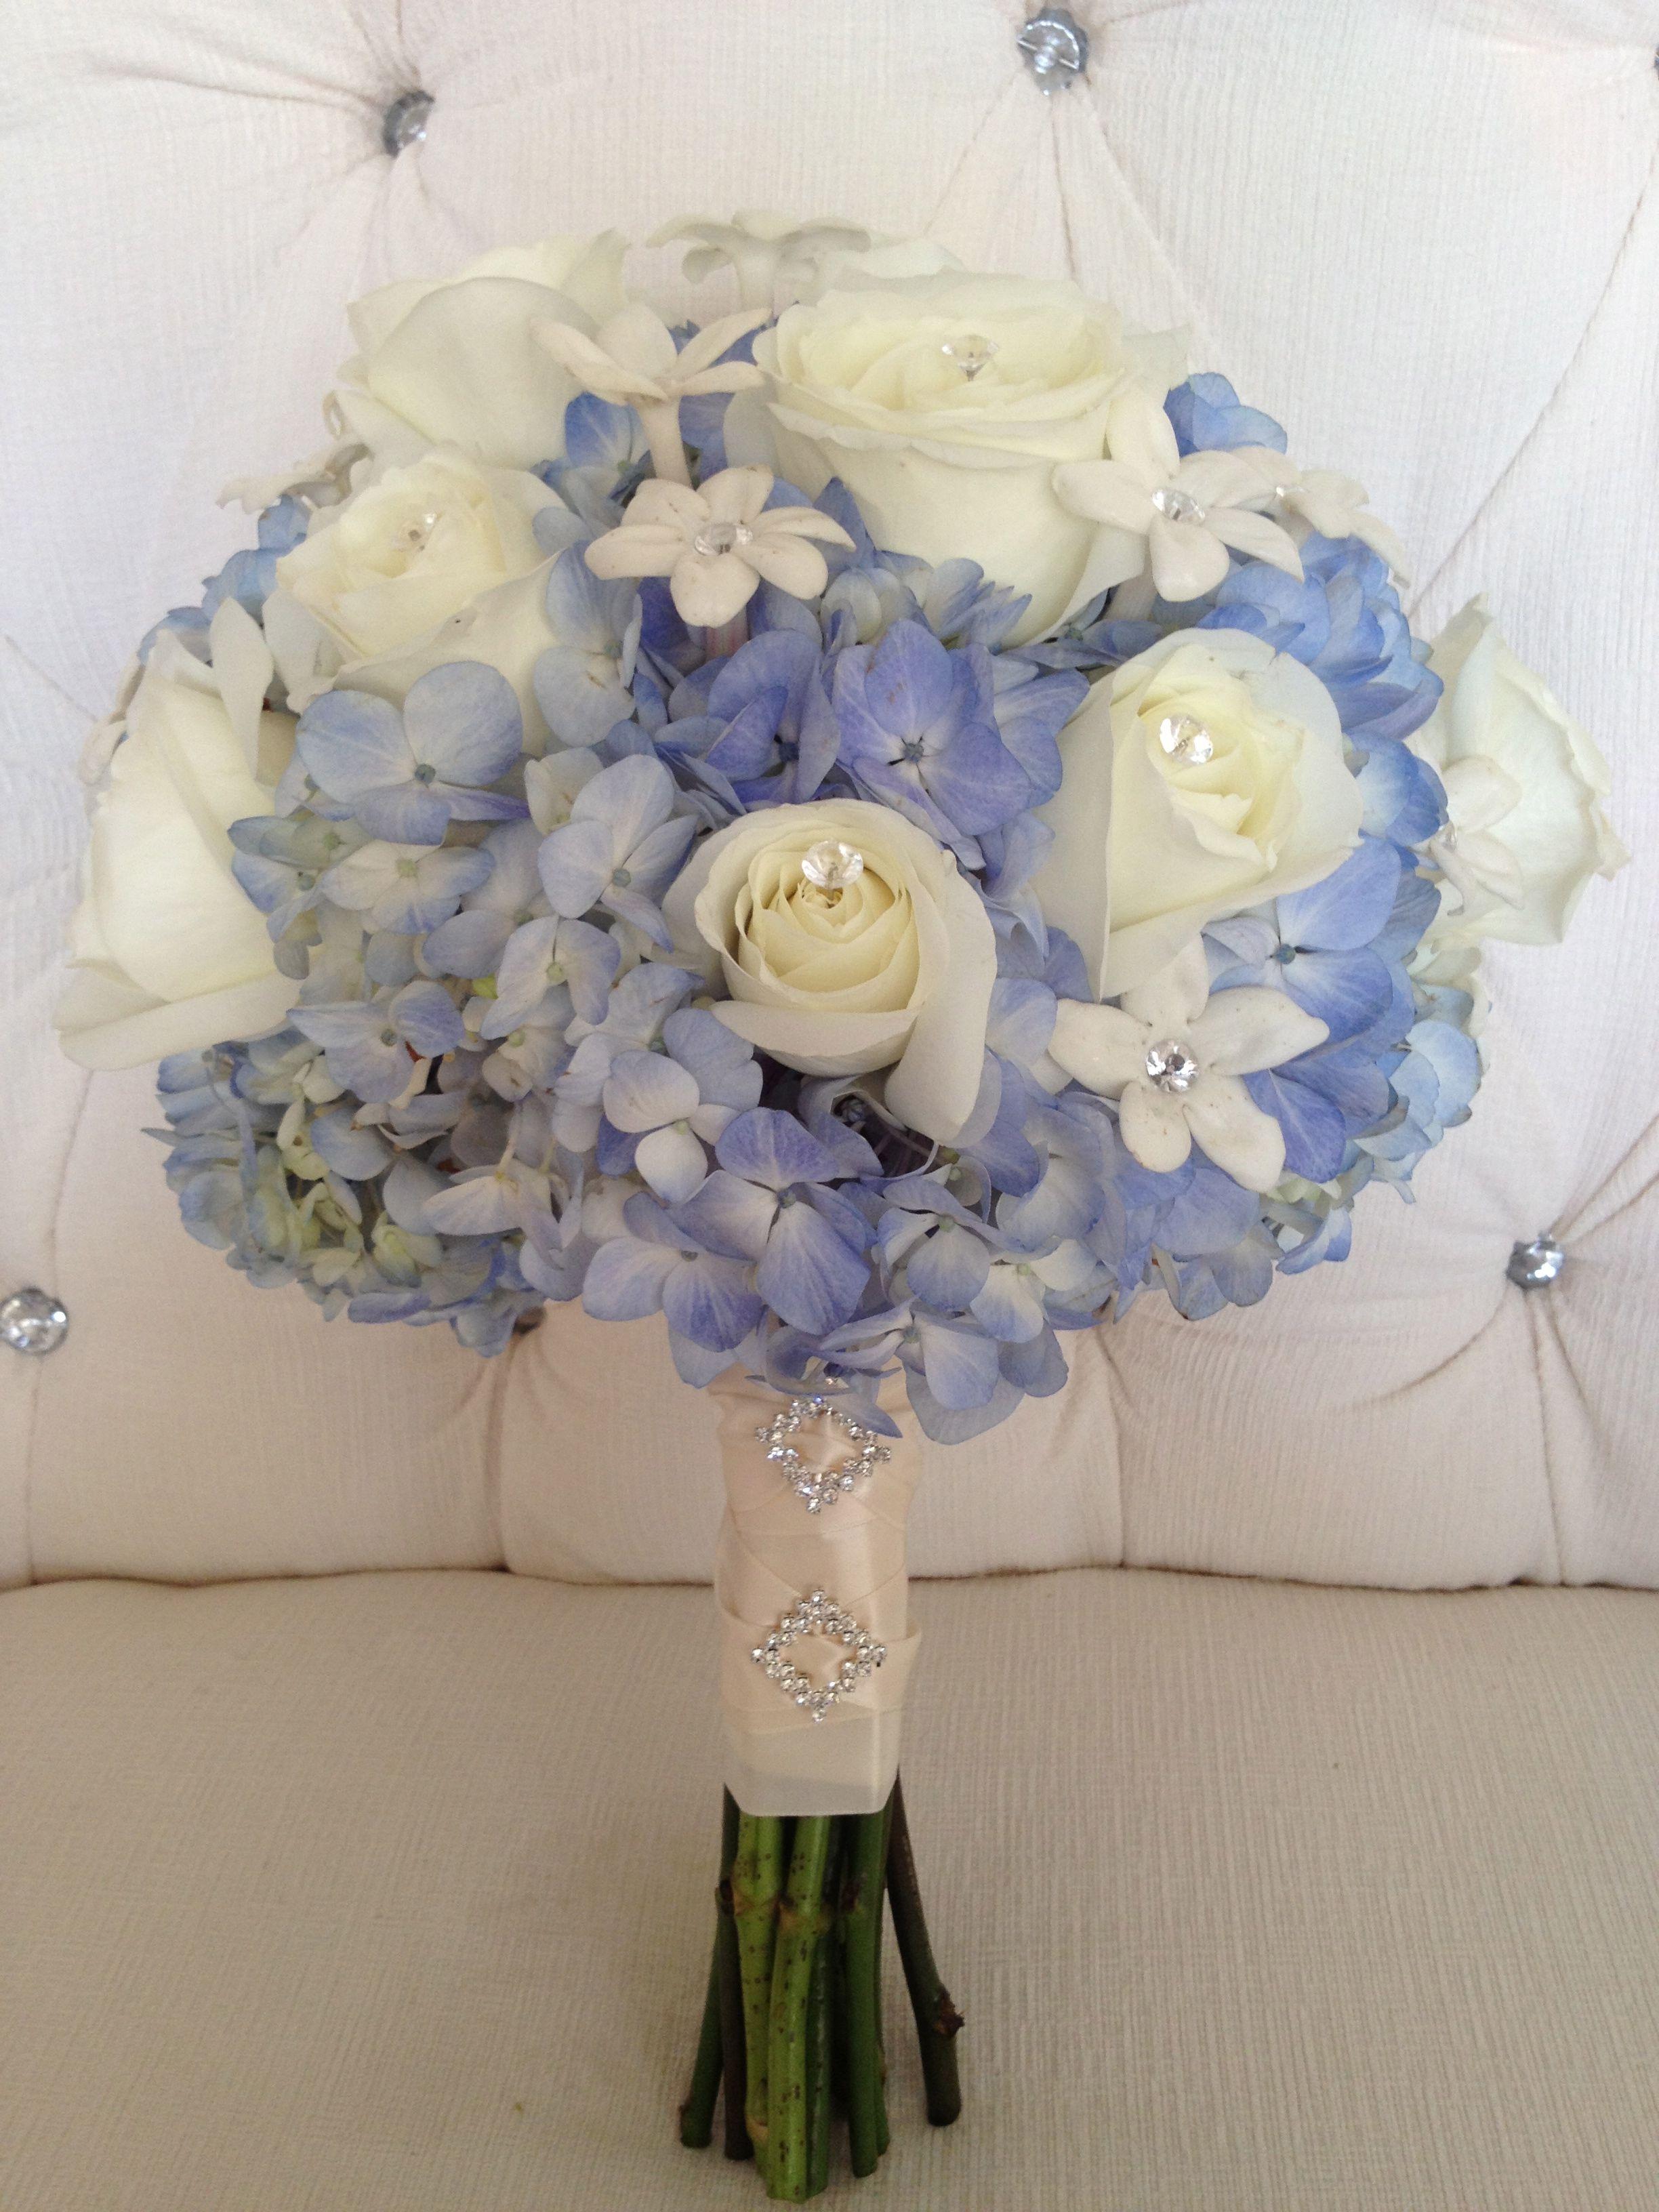 Full Blue Hydrangea With Giant White Roses And Rhinestone Centered Stephanotis Bridal Bouquet